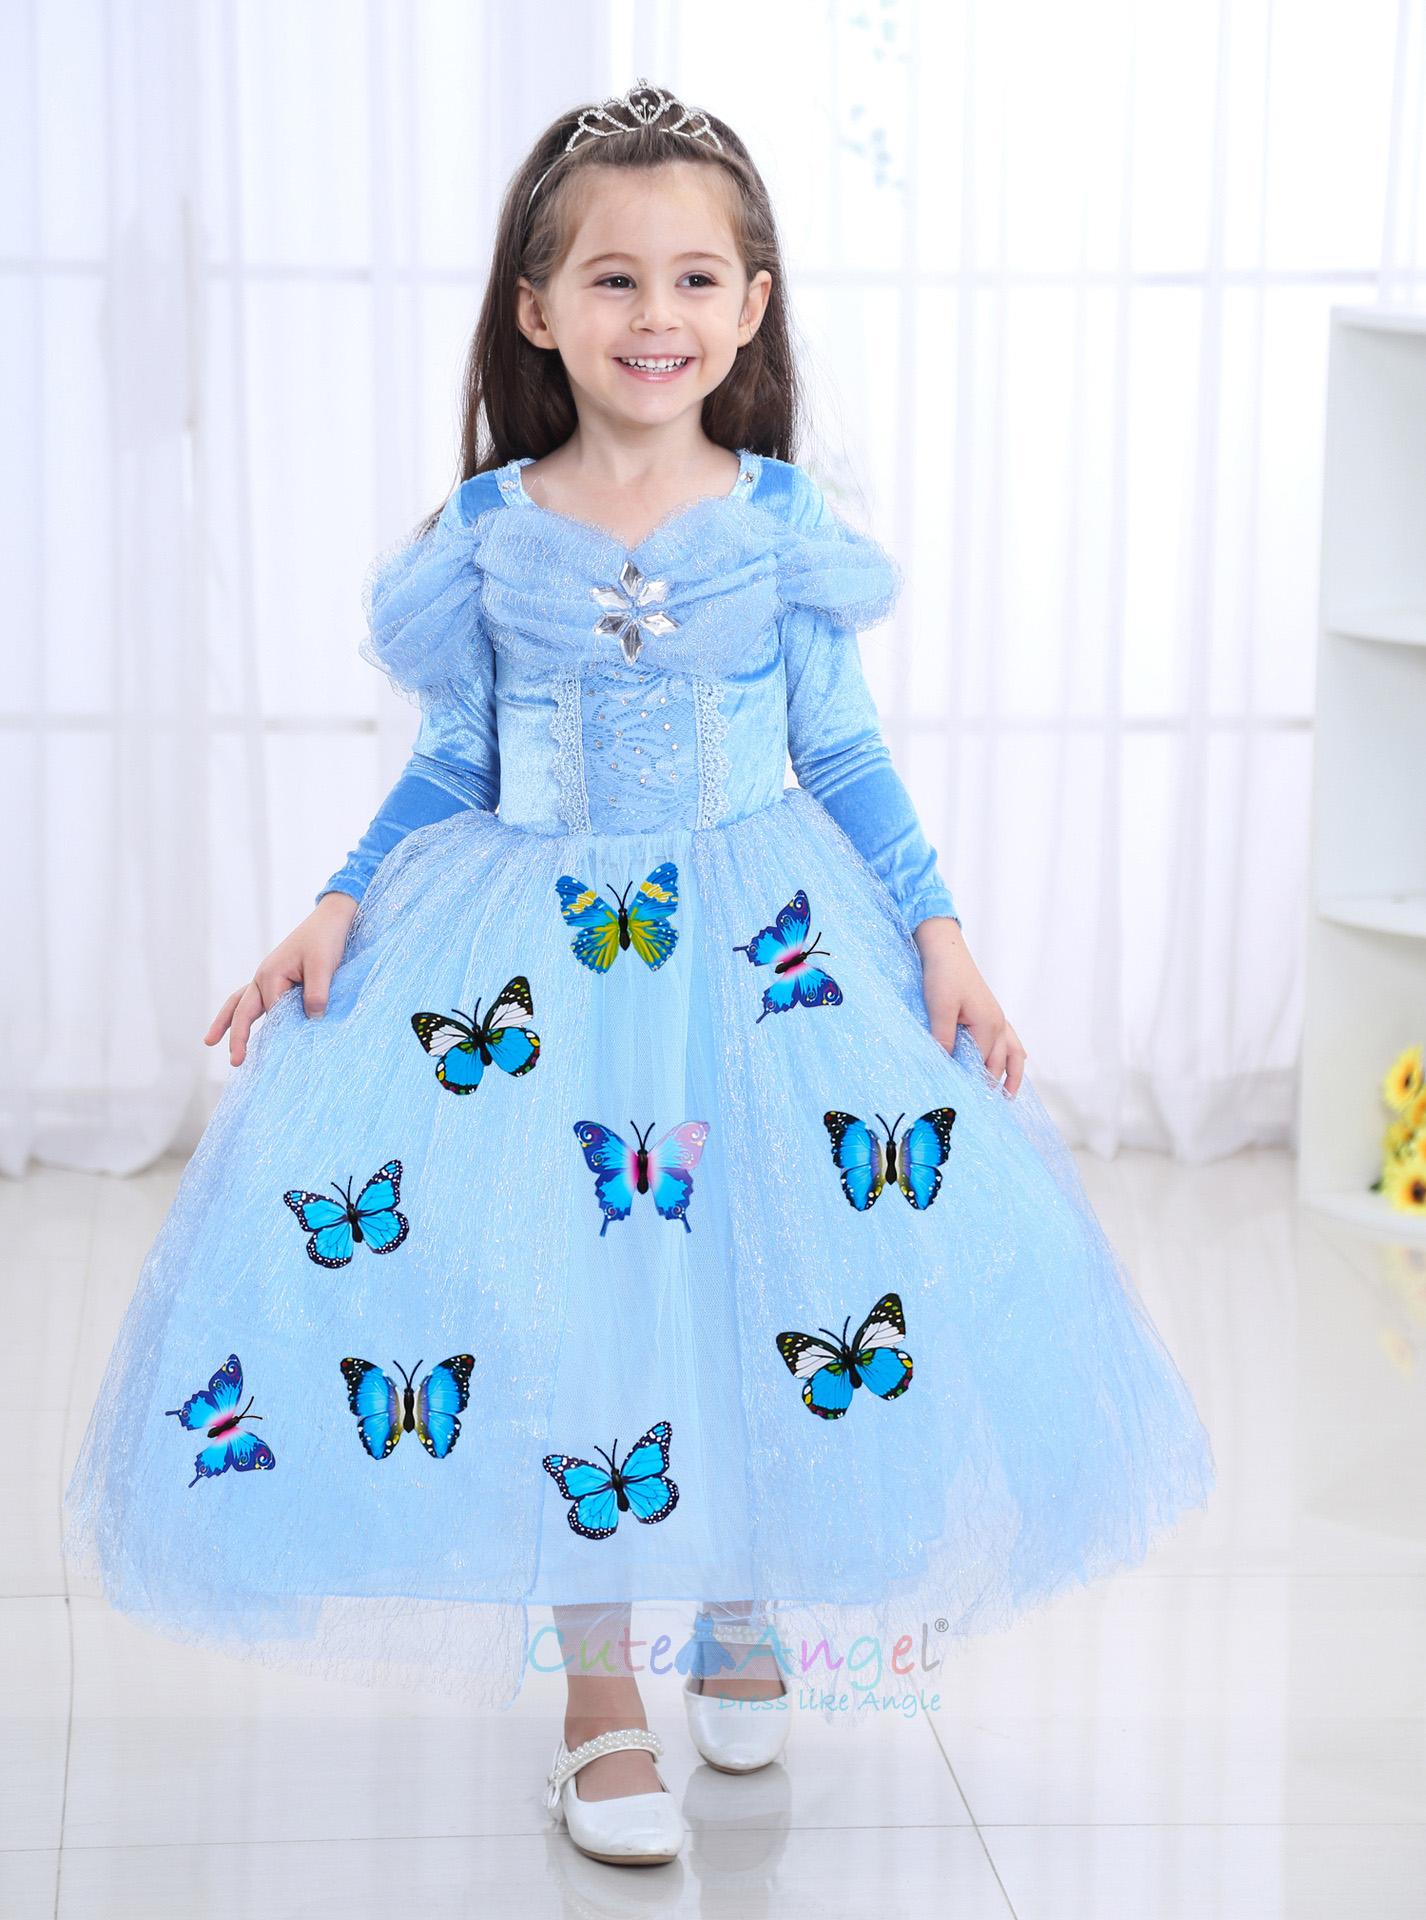 Halloween Girls Dress Cinderella Long Sleeve Princess Dress Girl Autumn Ice Romance Performance Costume Dress